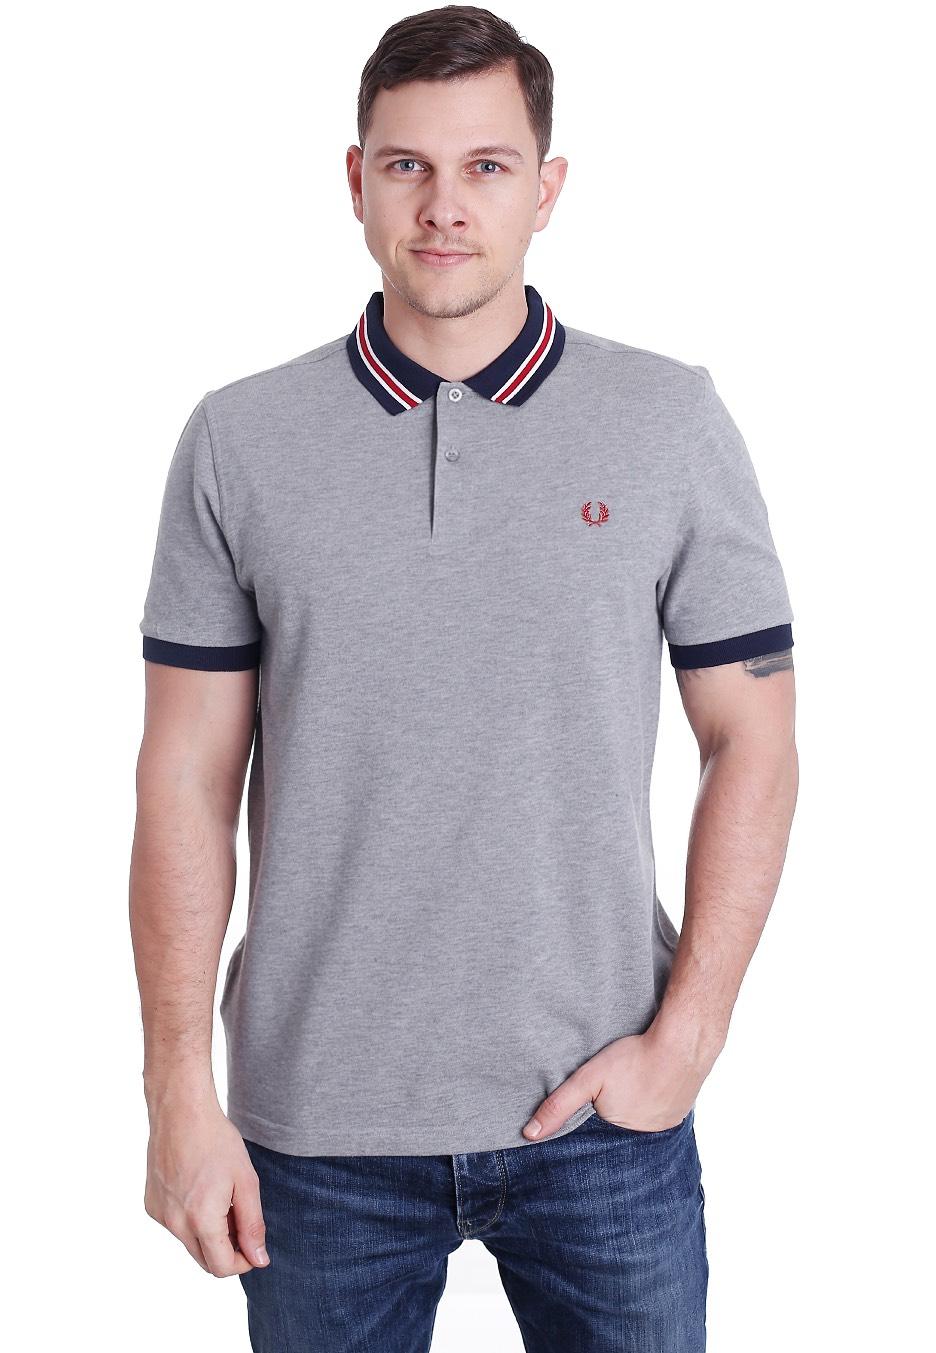 98ba630b4 Fred Perry - Bomber Stripe Collar Steel Marl - Polo - Streetwear ...